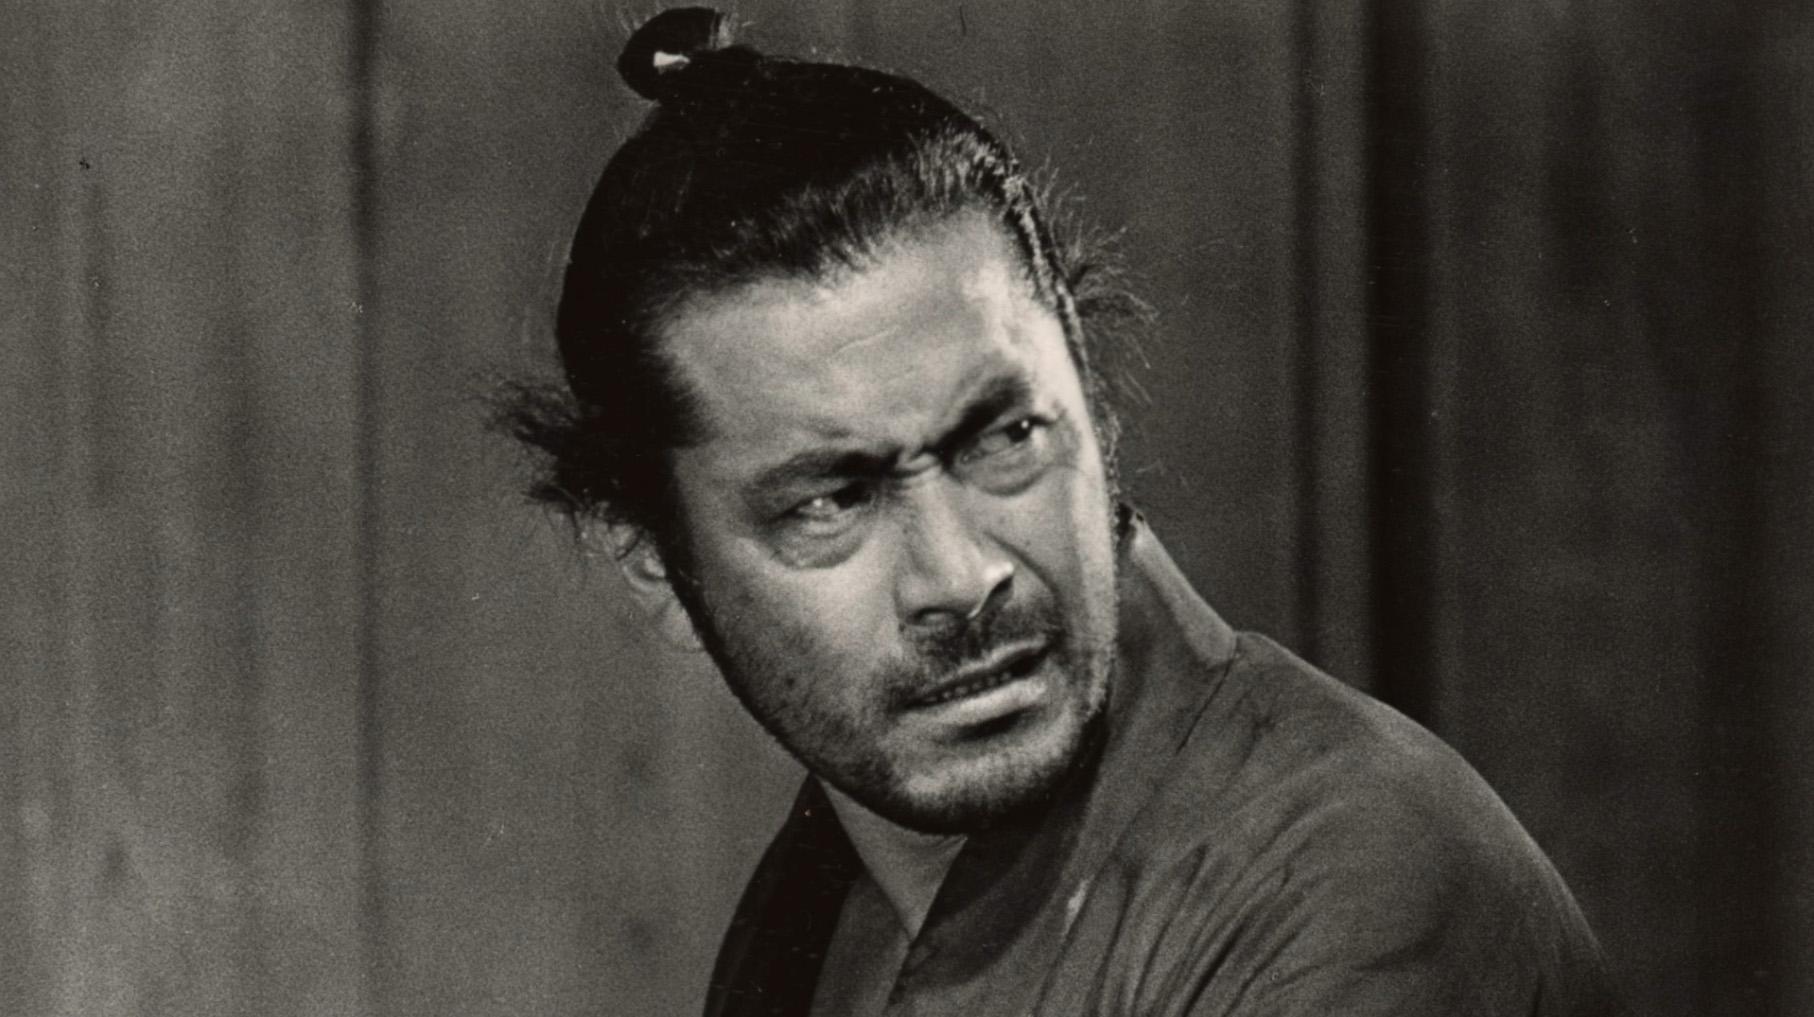 Toshirô Mifune's Complete Filmography